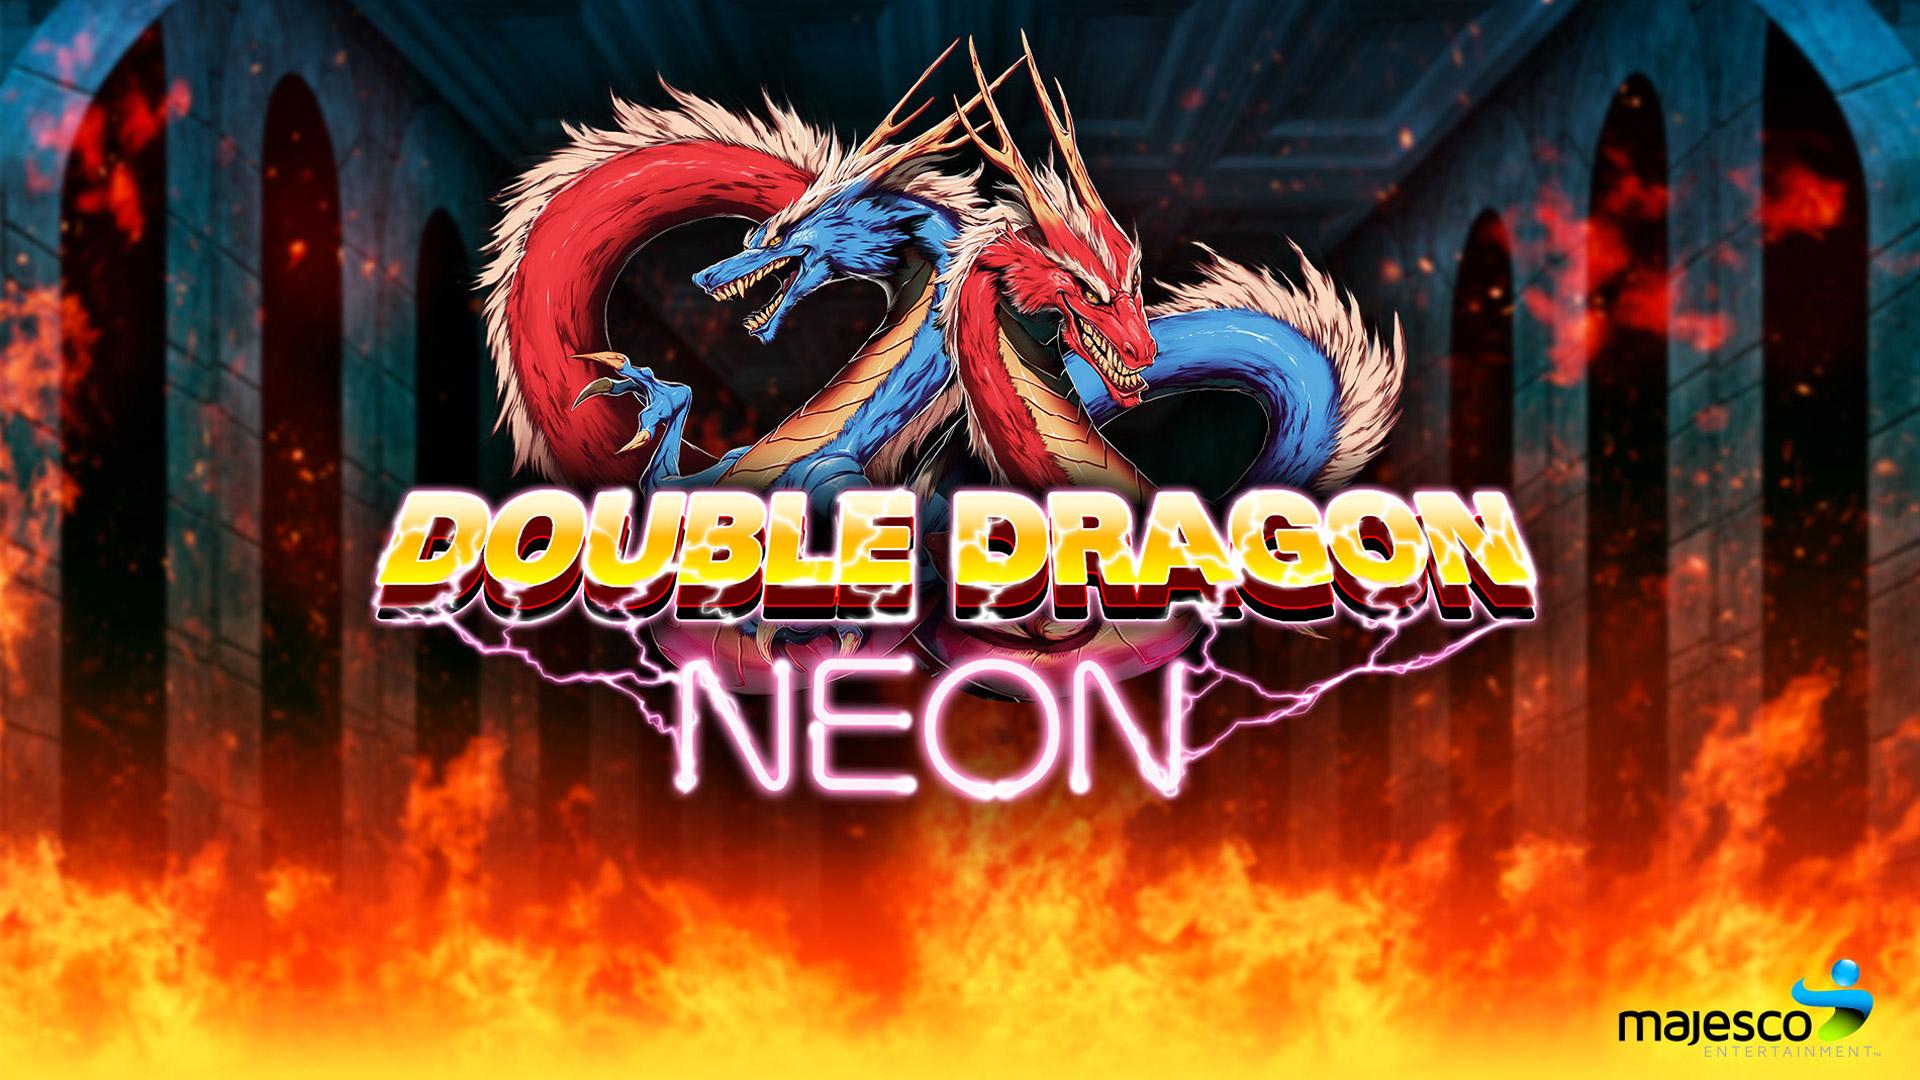 Free Double Dragon Neon Wallpaper in 1920x1080